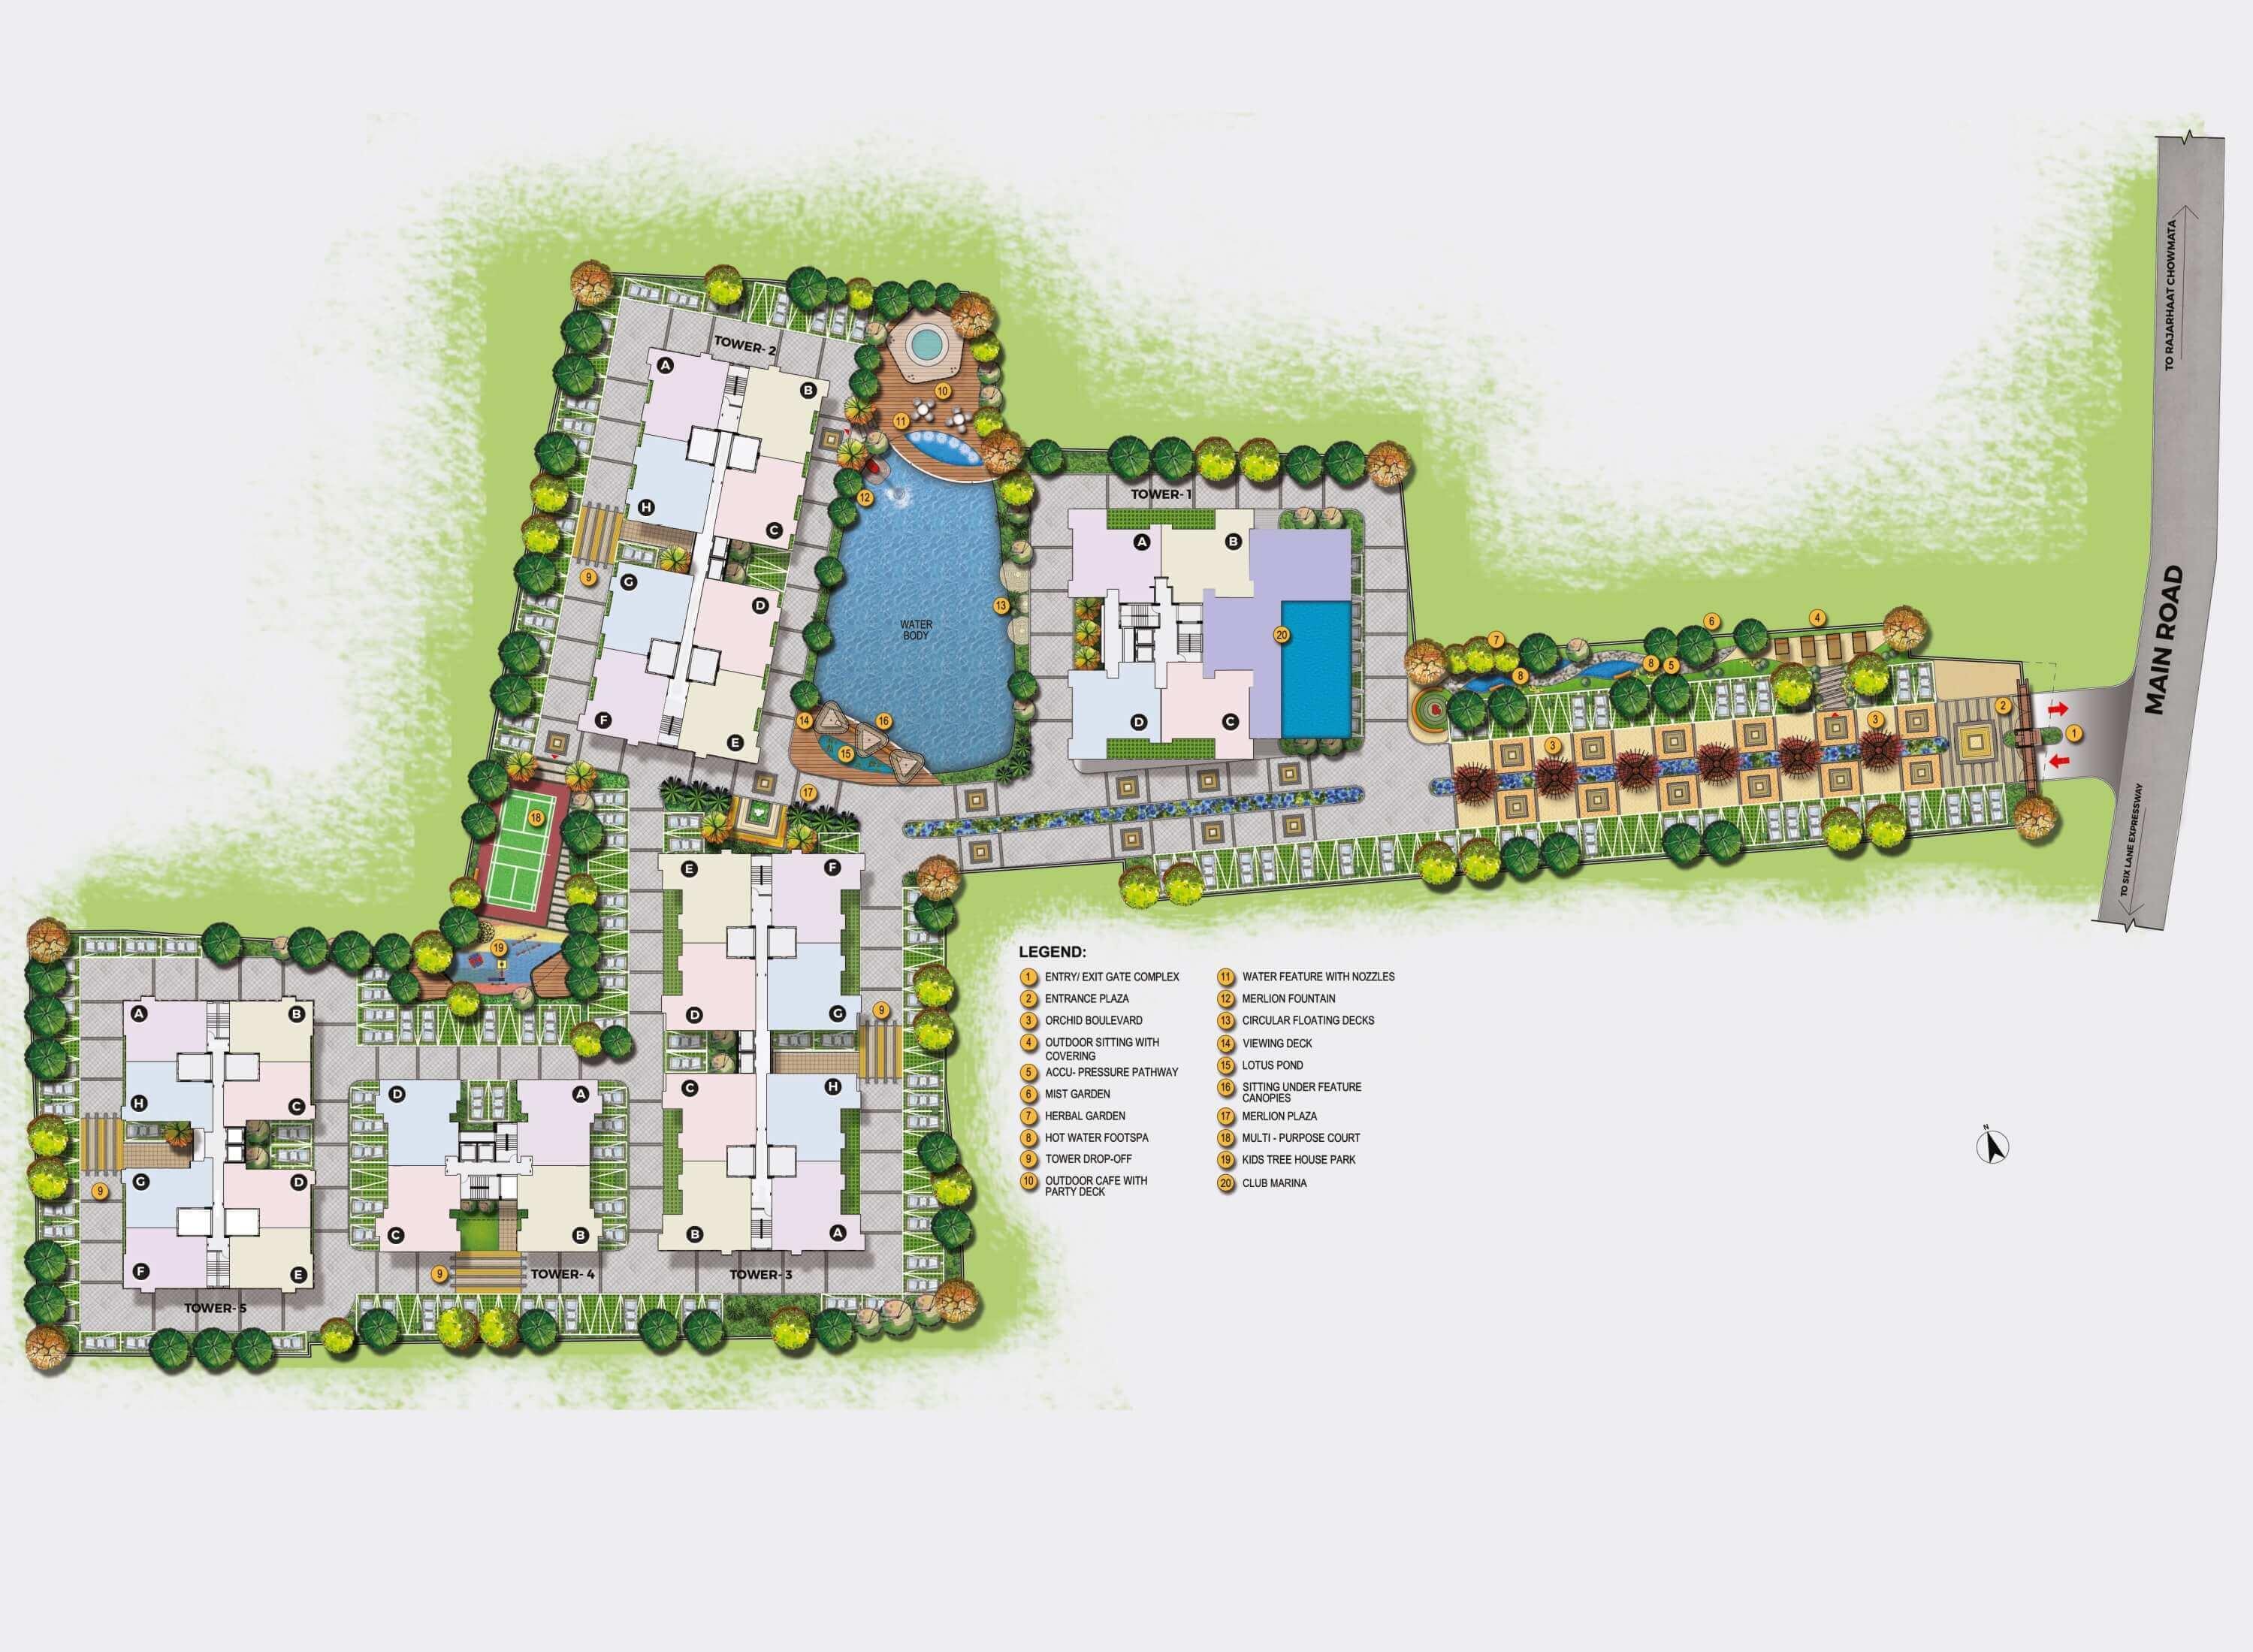 unimark merlion master plan image1